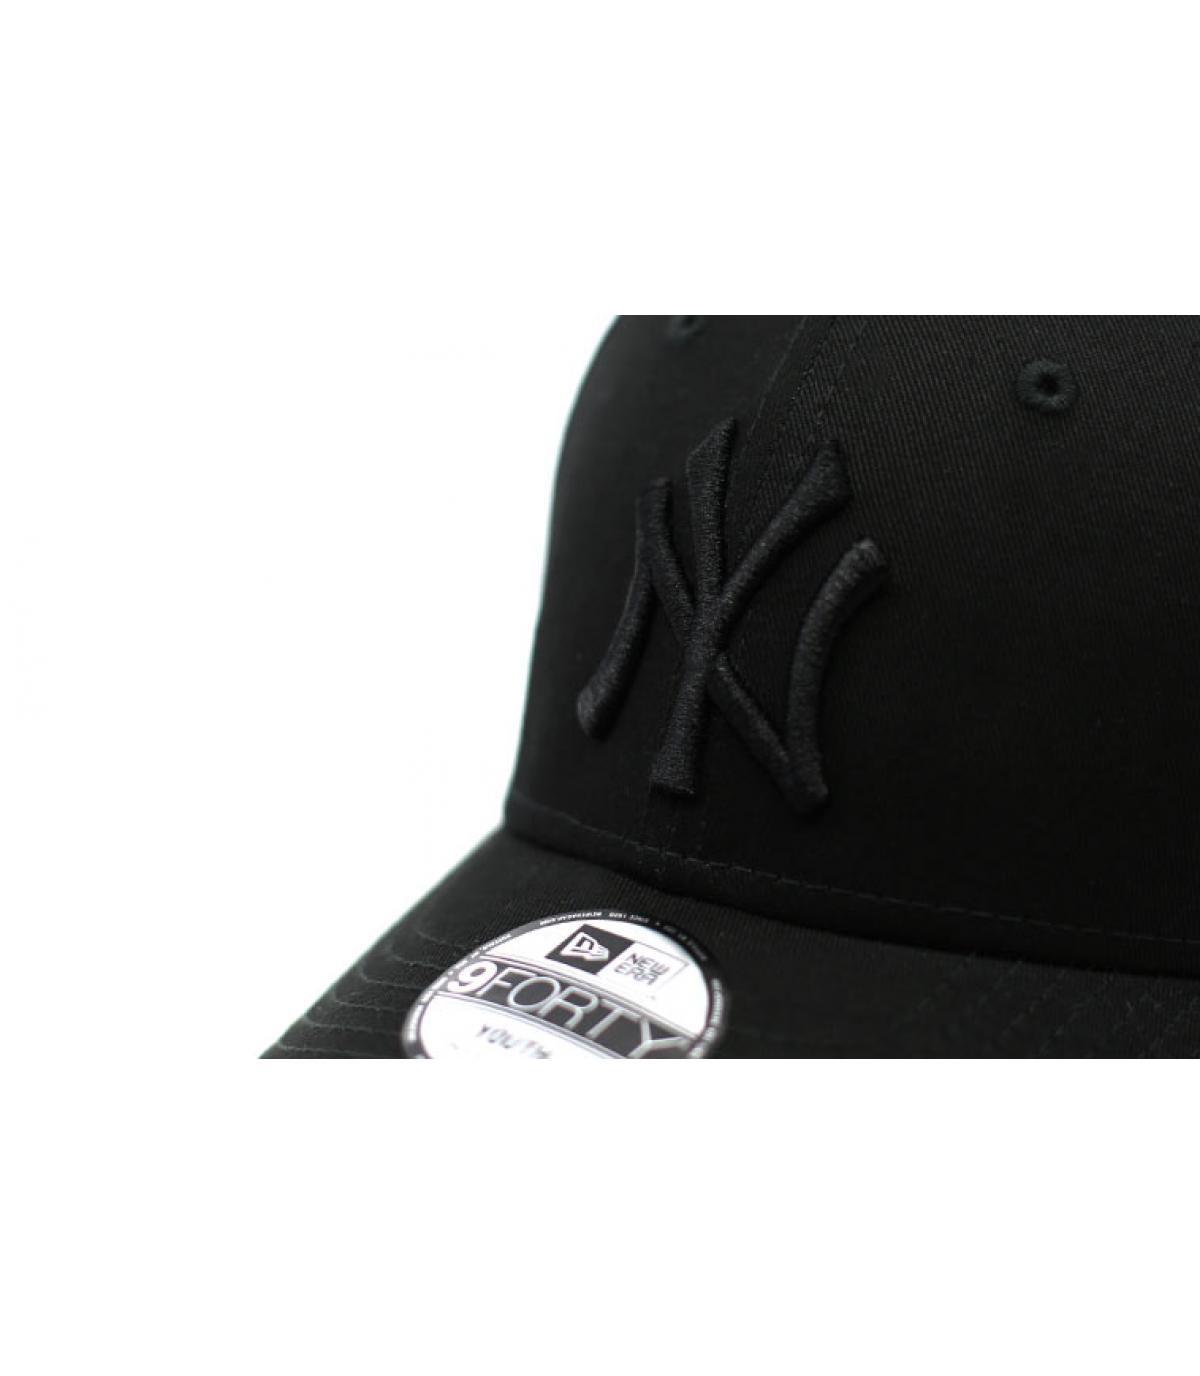 Details Cap Kids NY League Ess  9Forty black black - Abbildung 3